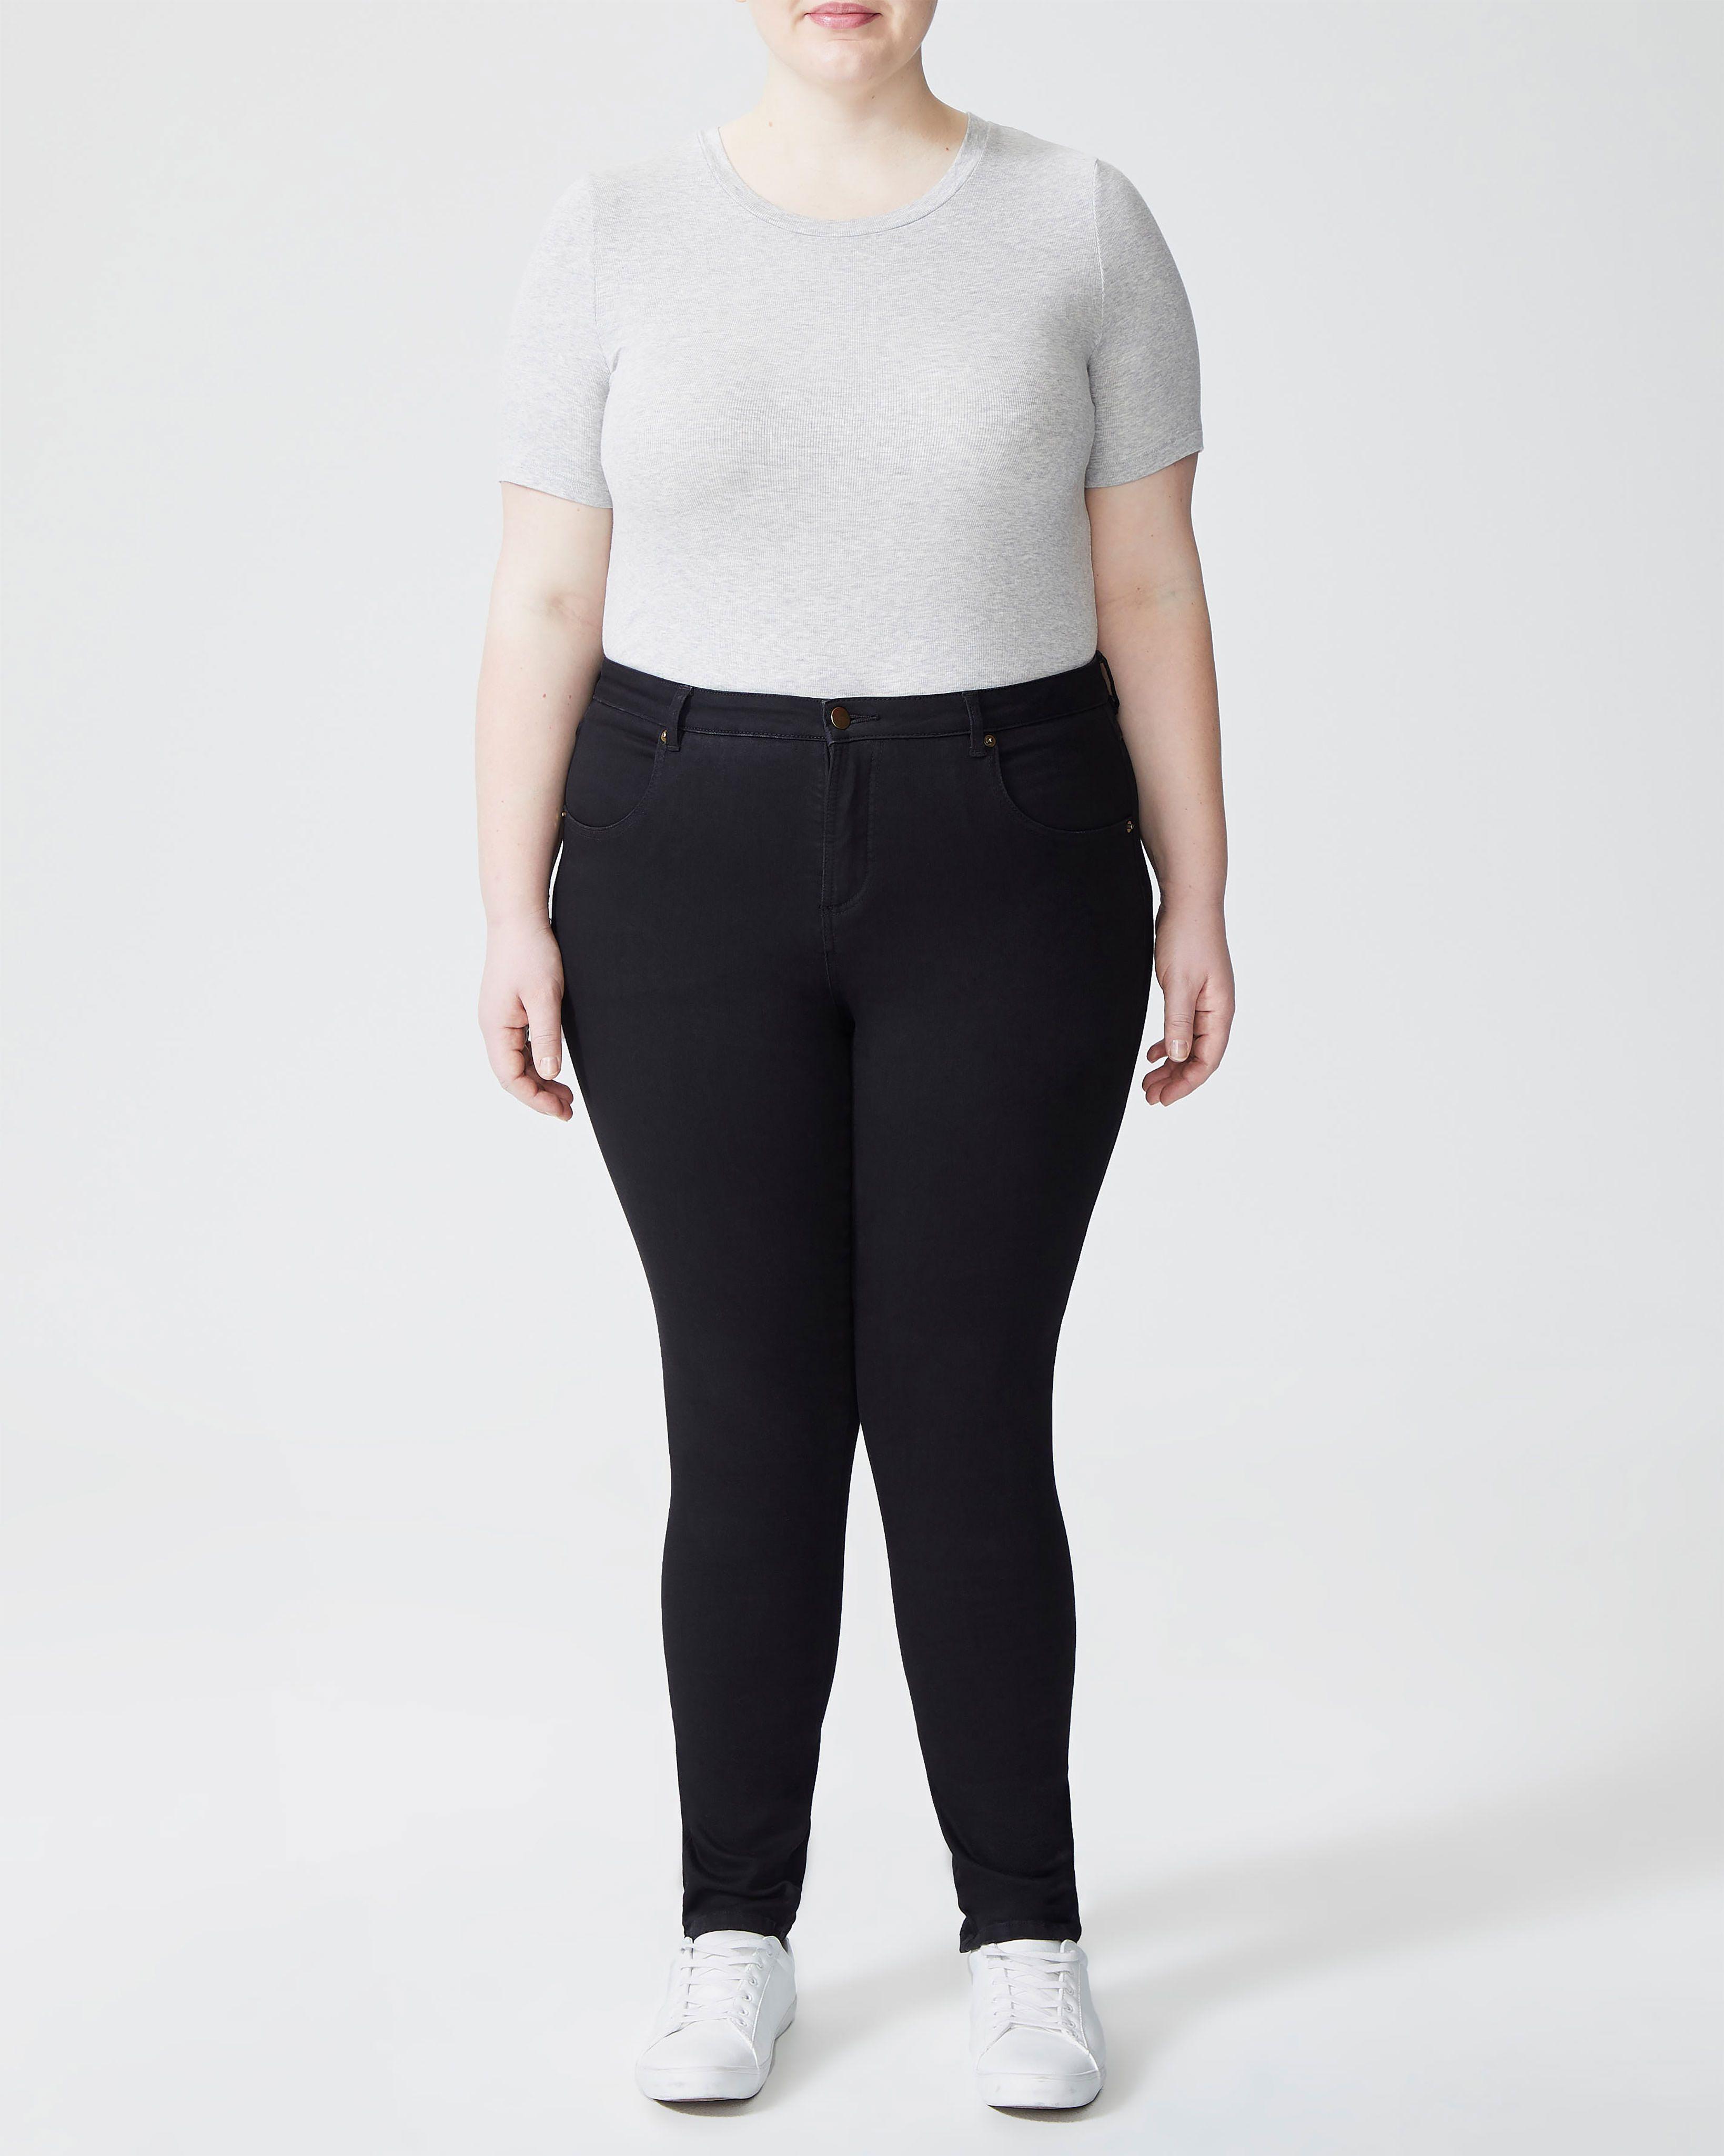 Seine Mid Rise Skinny Jeans 32 Inch - Black